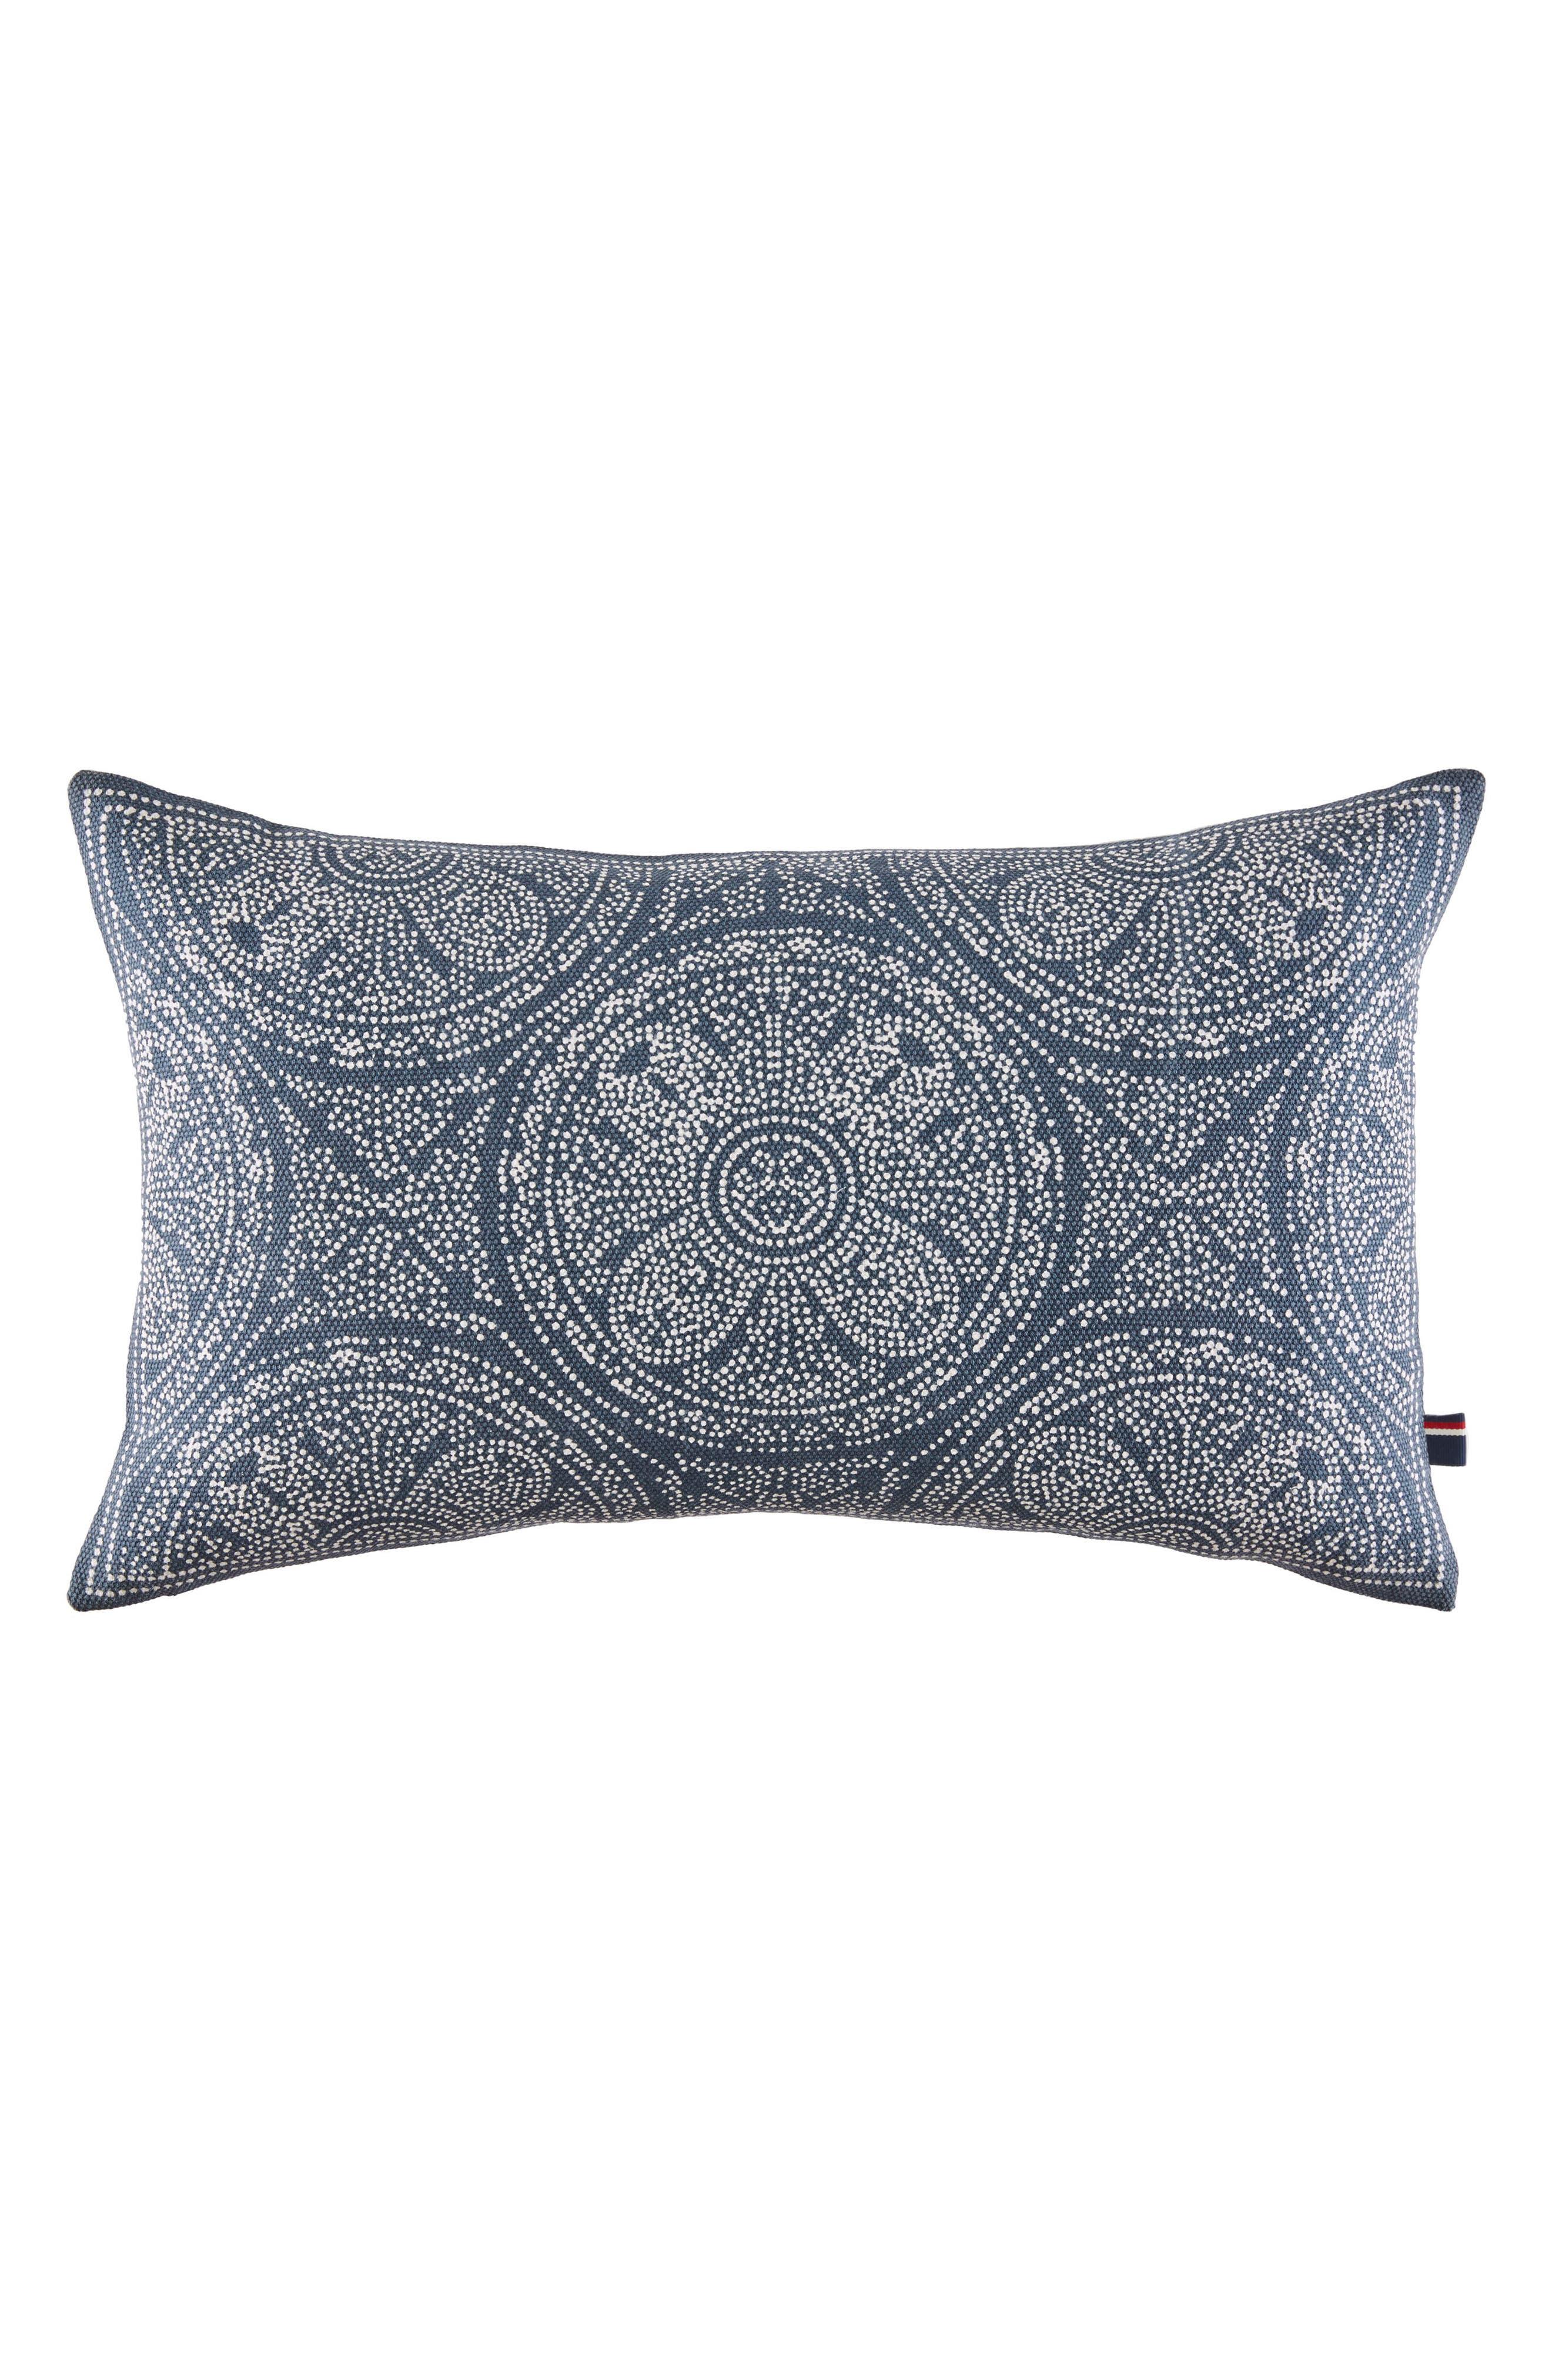 Batik Indigo Accent Pillow,                         Main,                         color, Navy